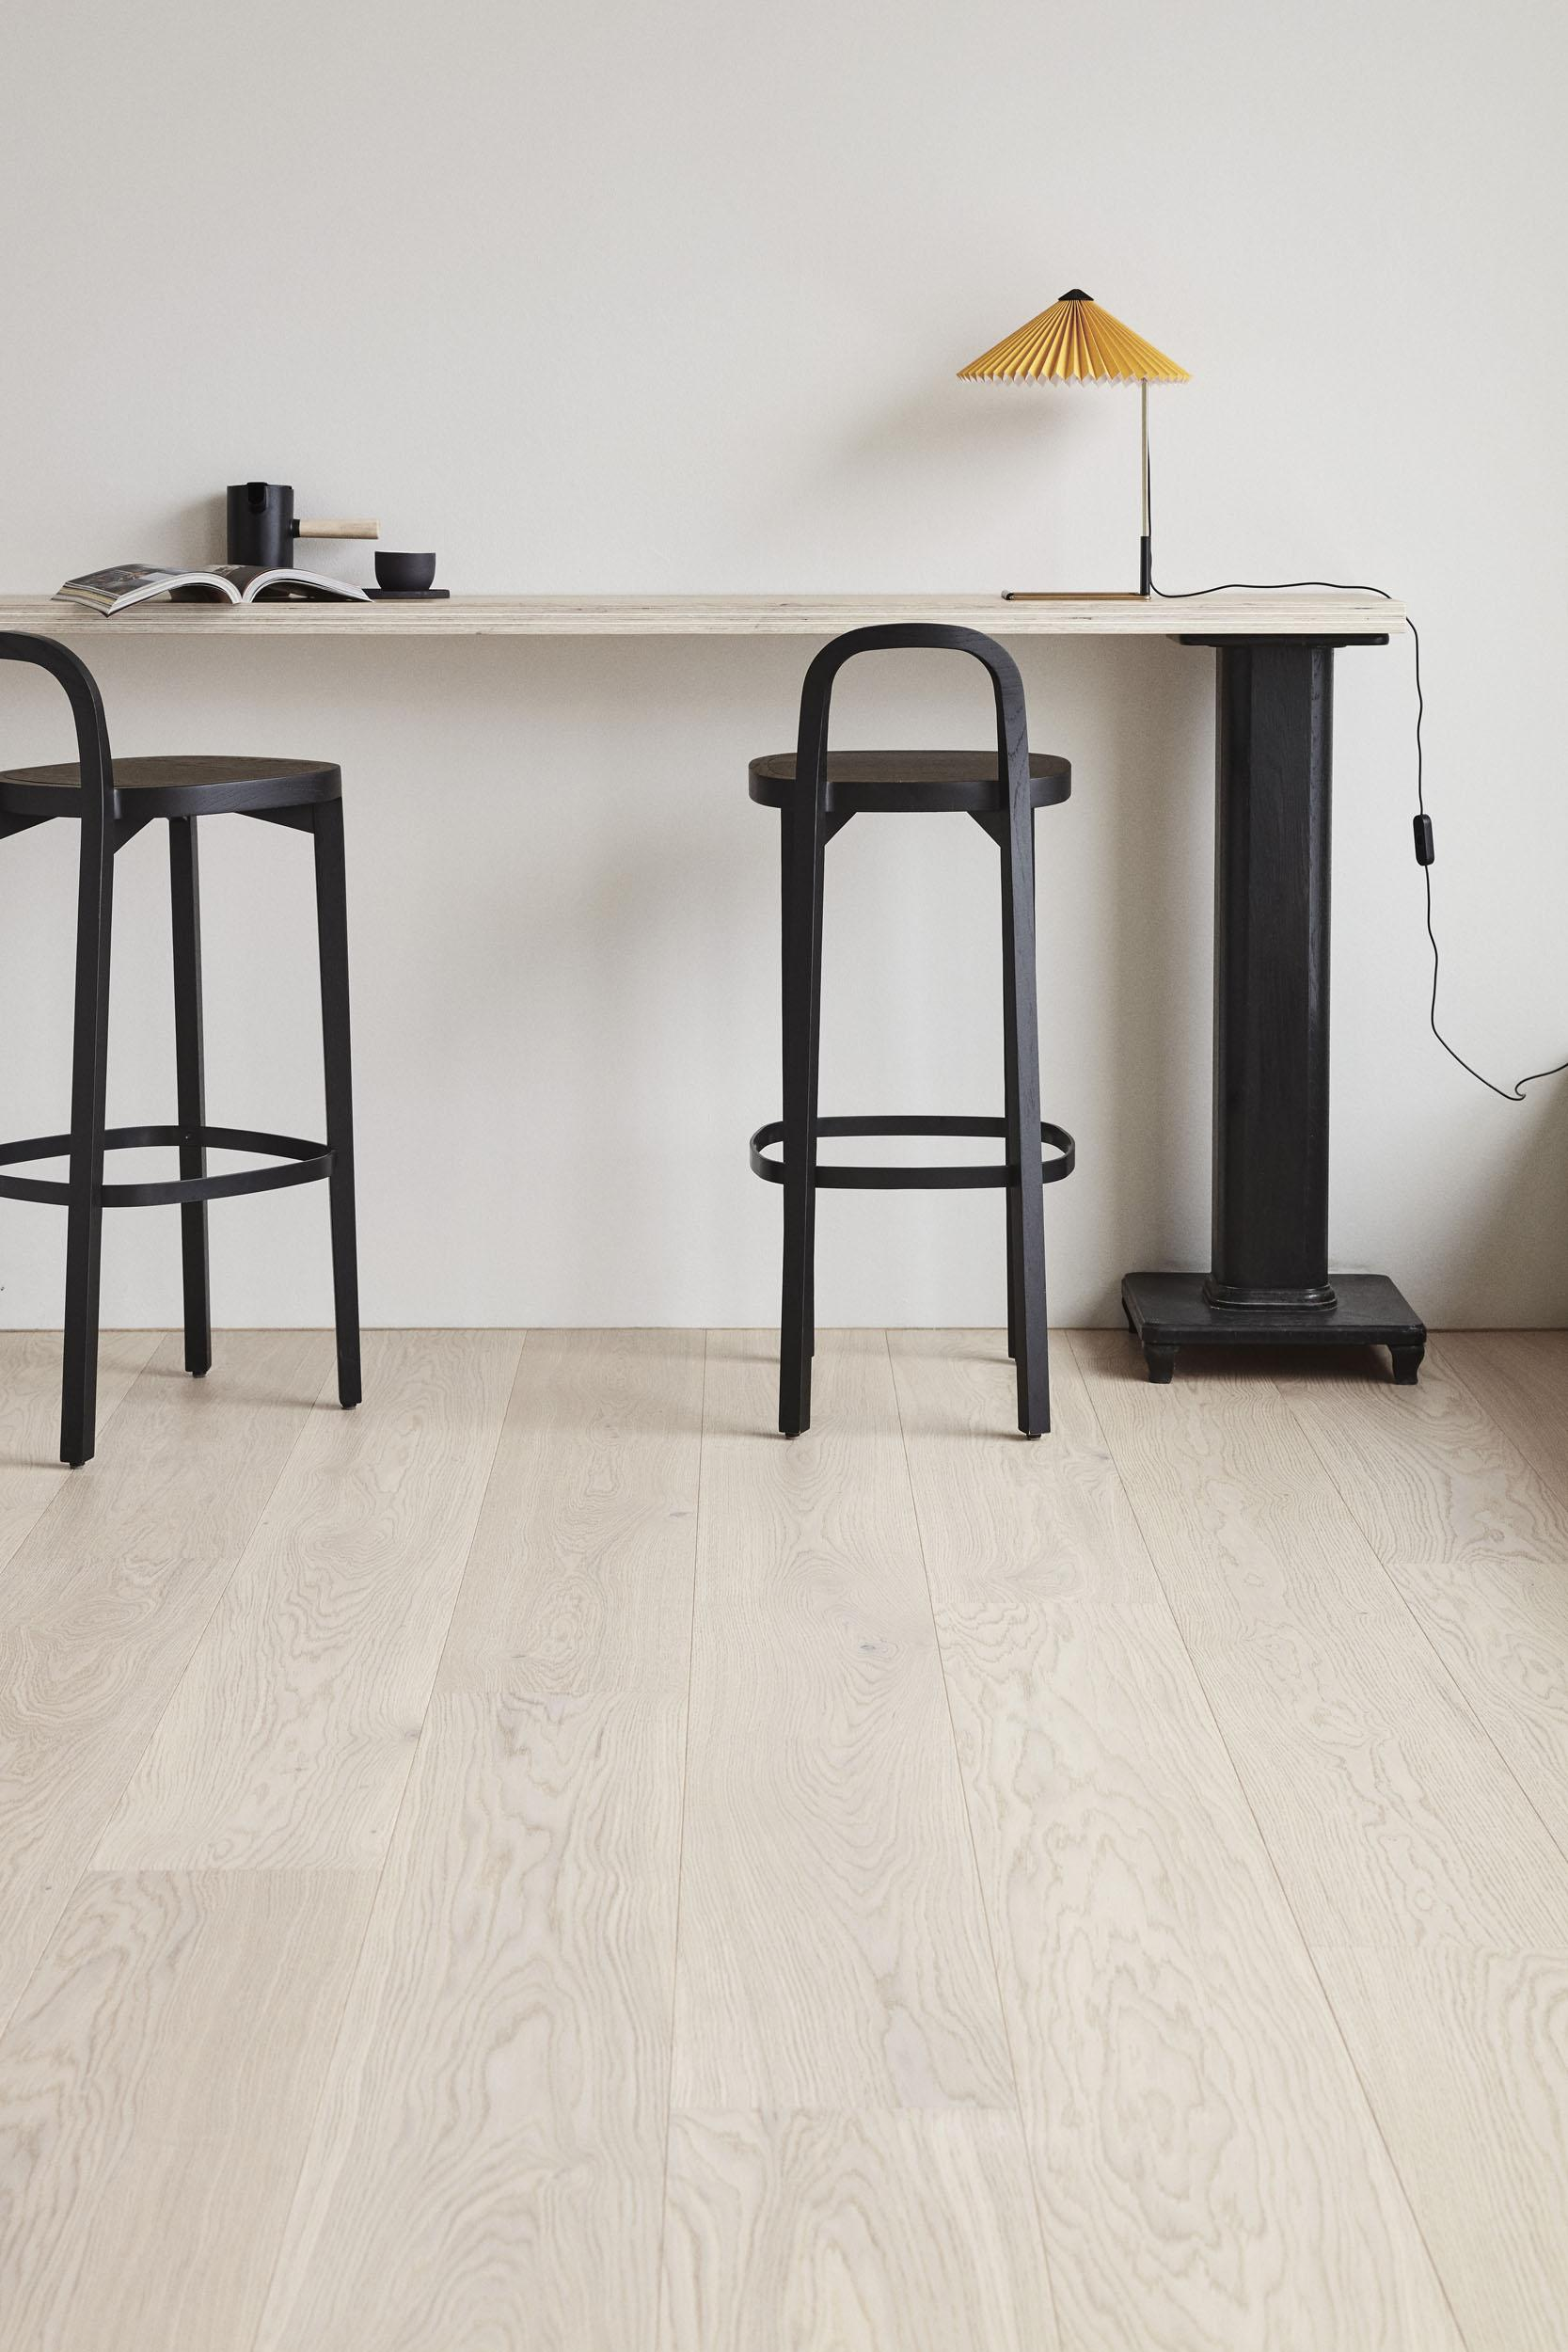 Timberwise-parketti-puulattia-wooden-floor-parquet-Tammi-Oak-sky-white